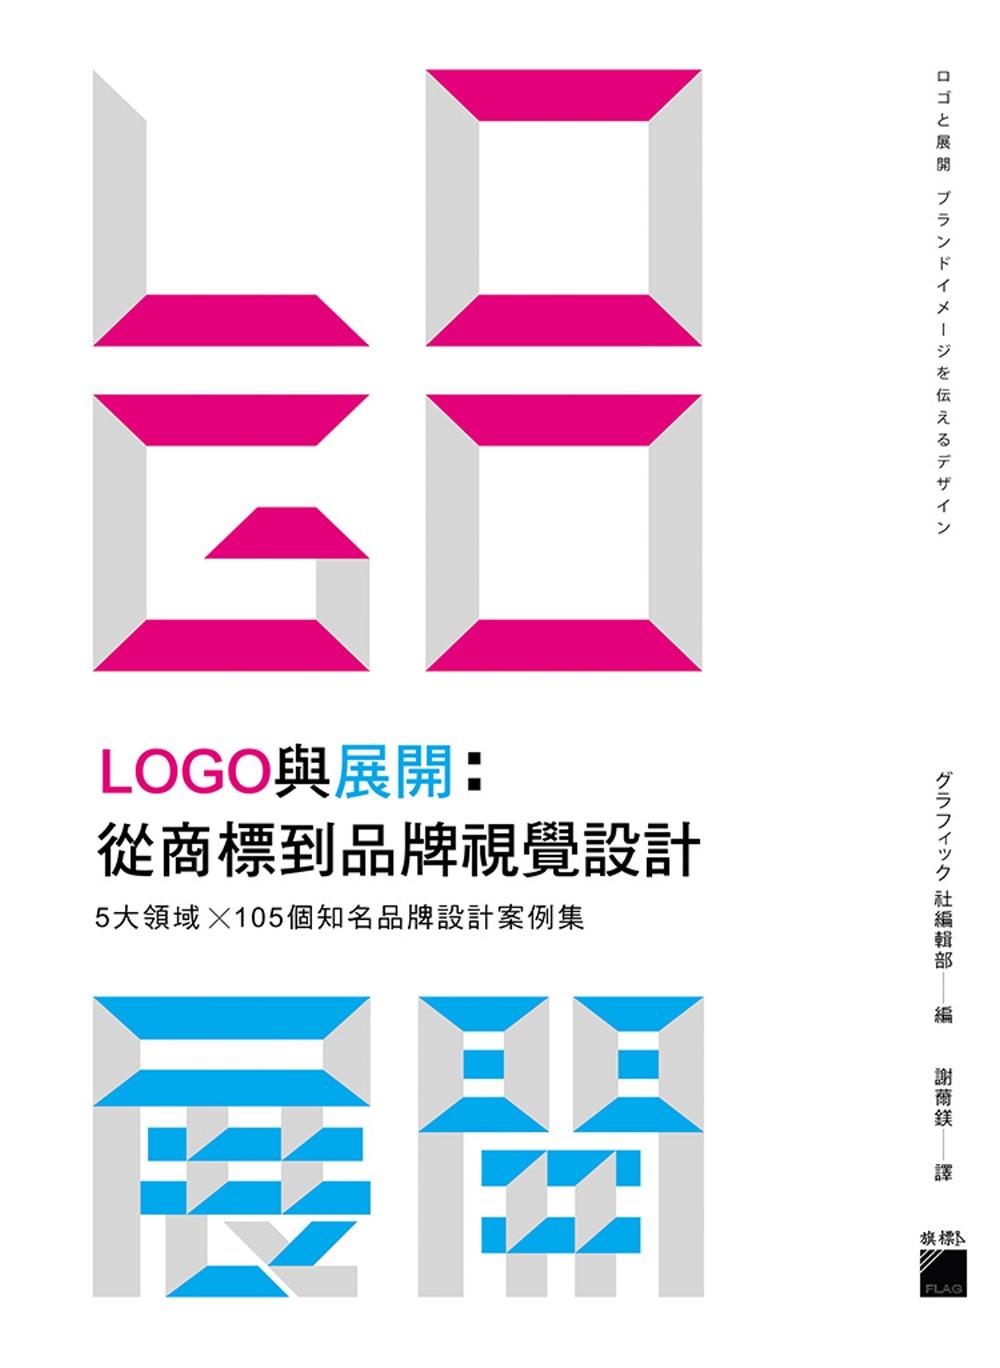 LOGO與展開:從商標到品牌視覺設計:5大領域×105個知名品牌設計案例集